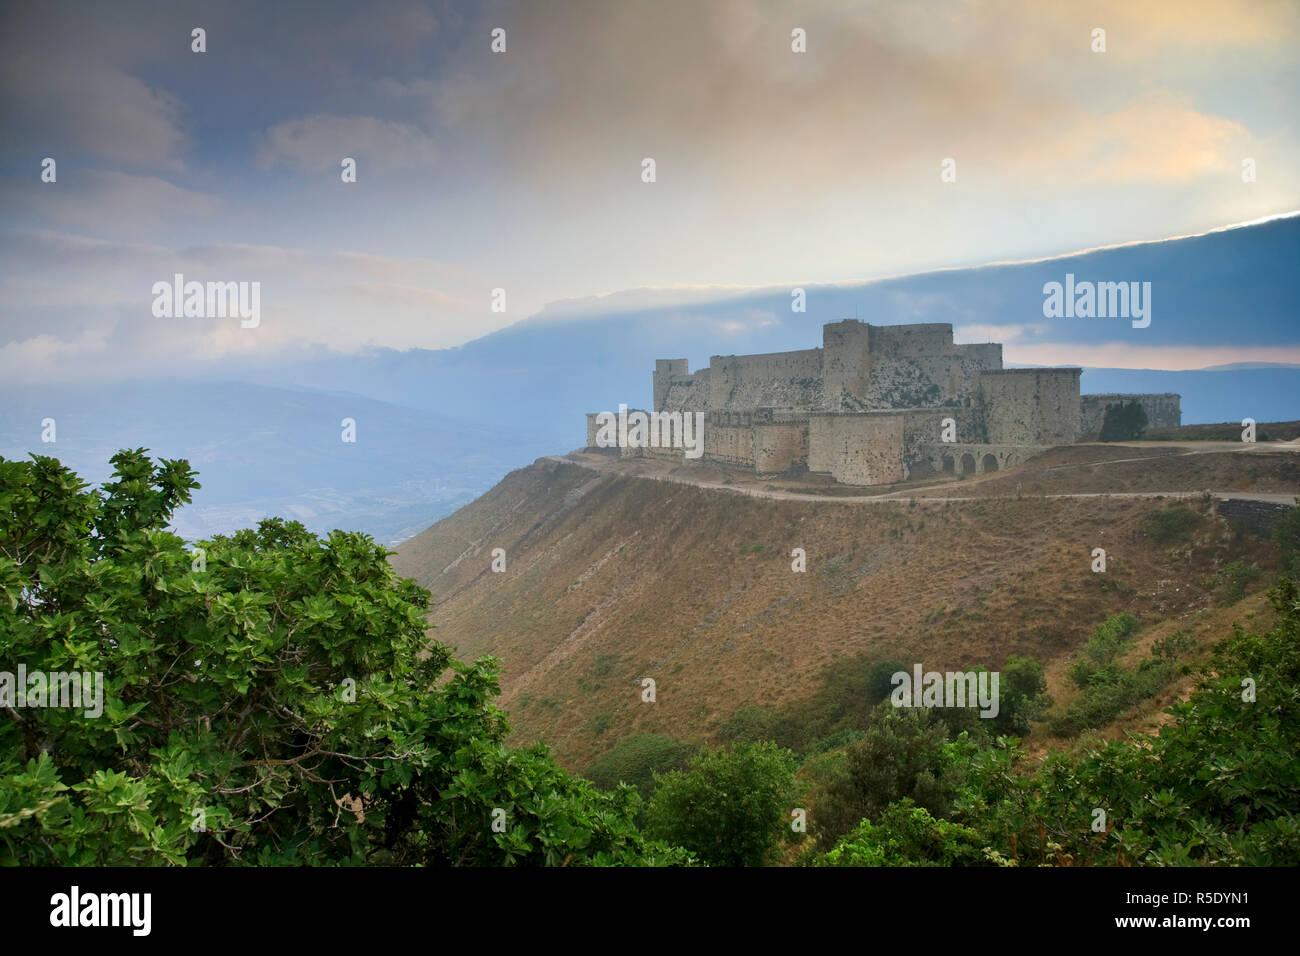 Syria, crusader's castle of Krak Des Chevaliers (Qala'at al Hosn), a UNESCO Site - Stock Image